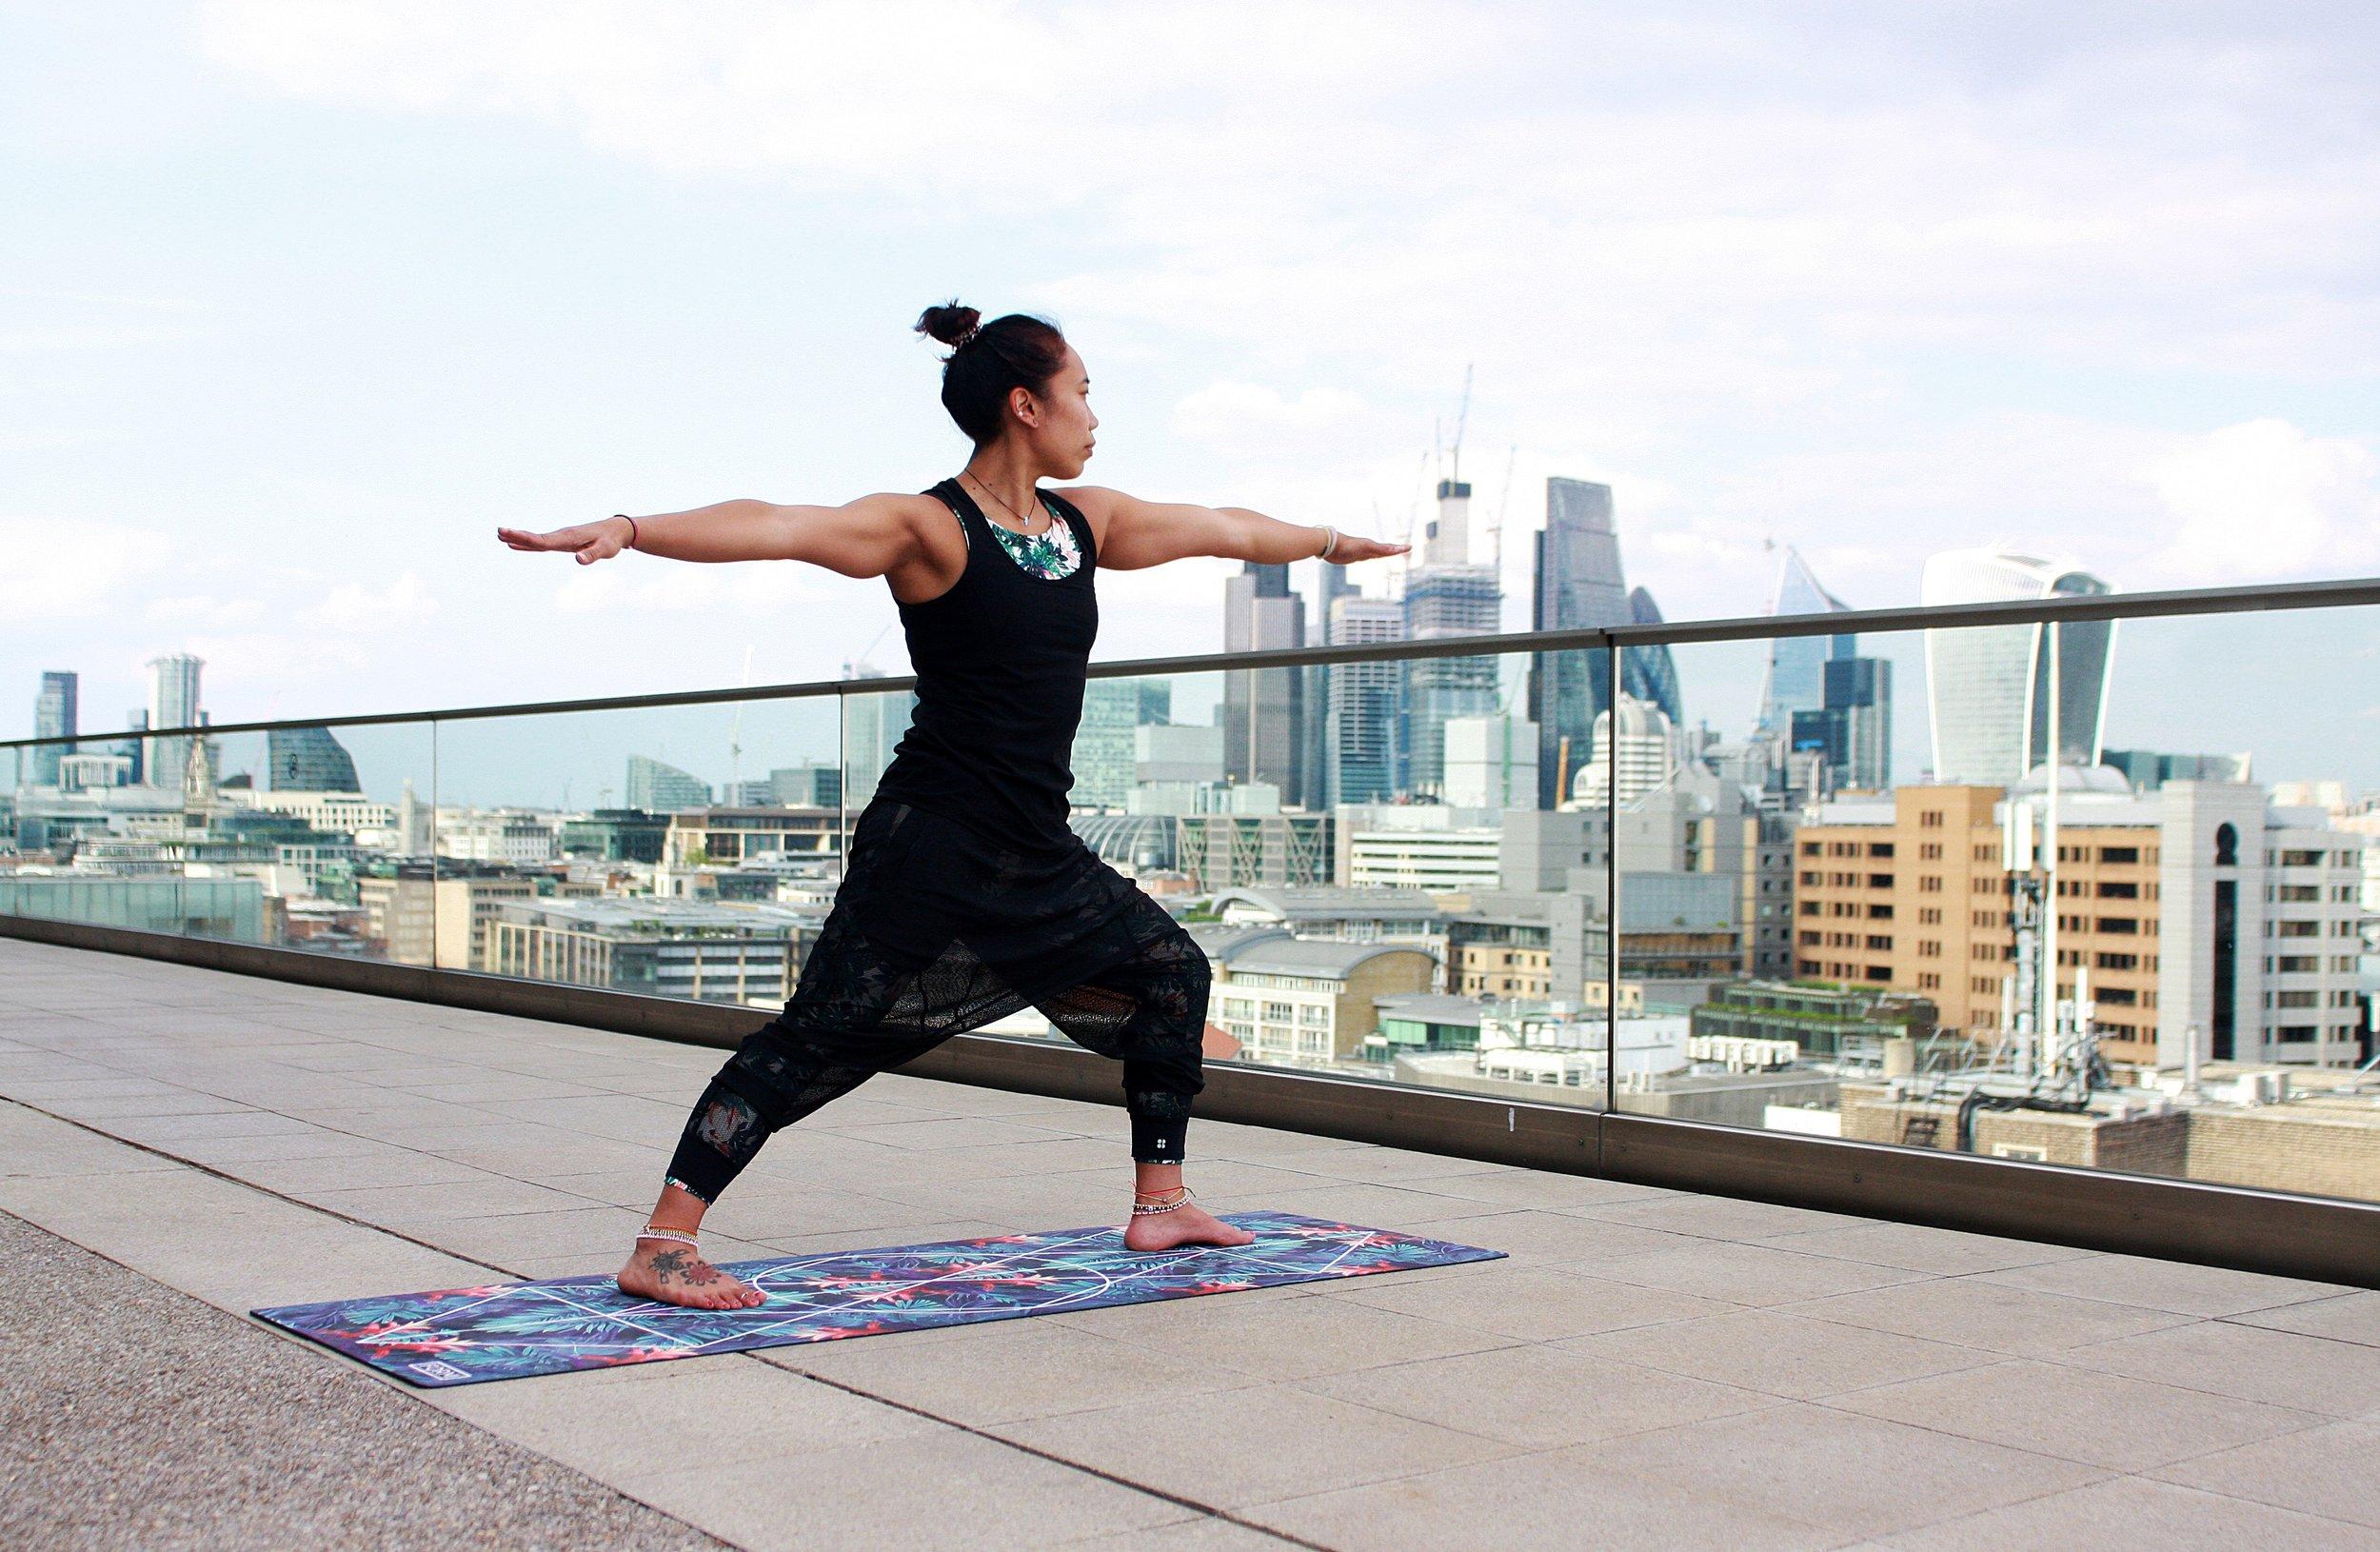 acro-acro-pose-acro-yoga-1139495.jpg